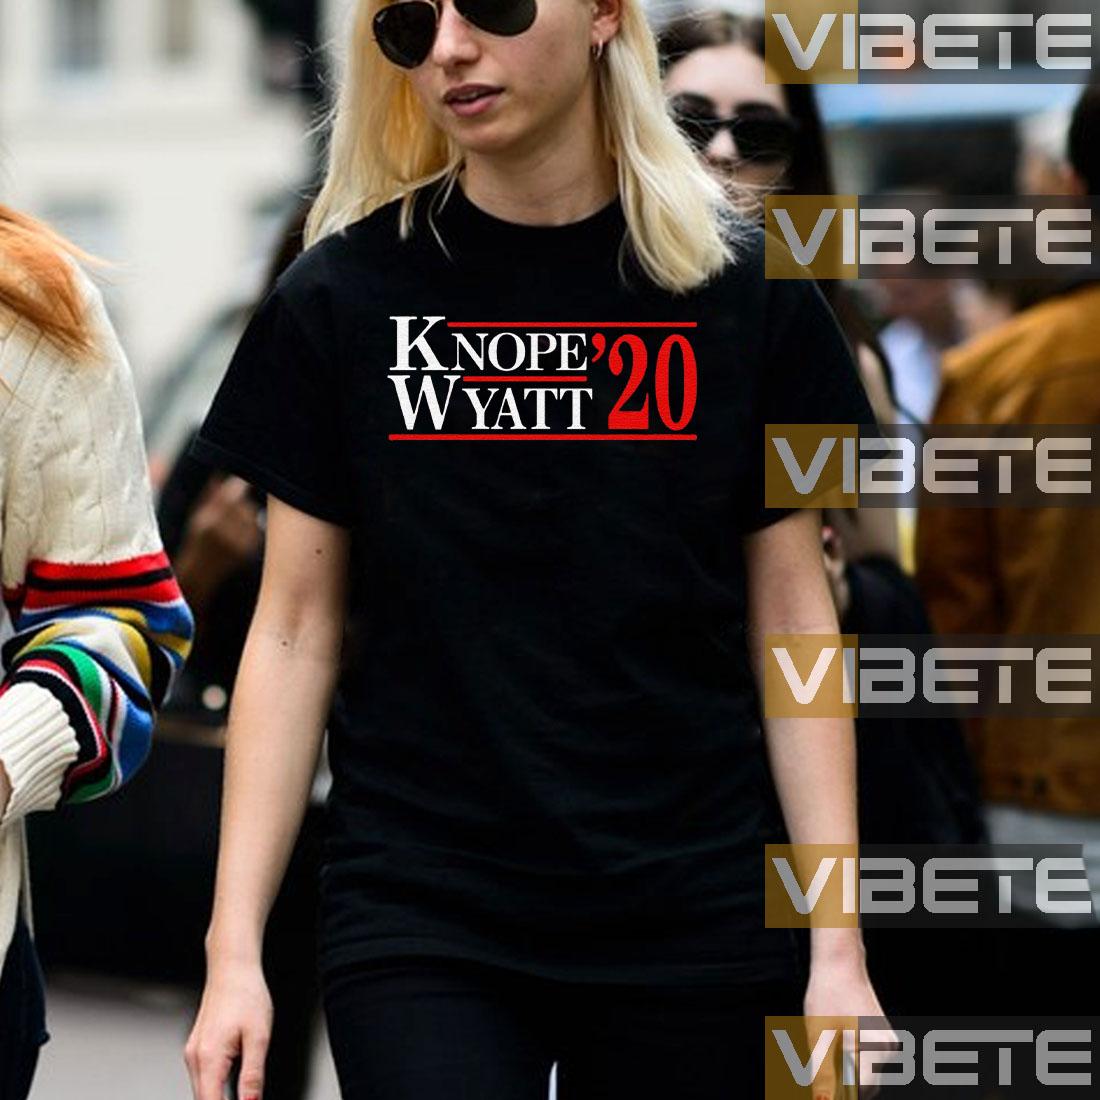 Knope Wyatt 2020 TShirts